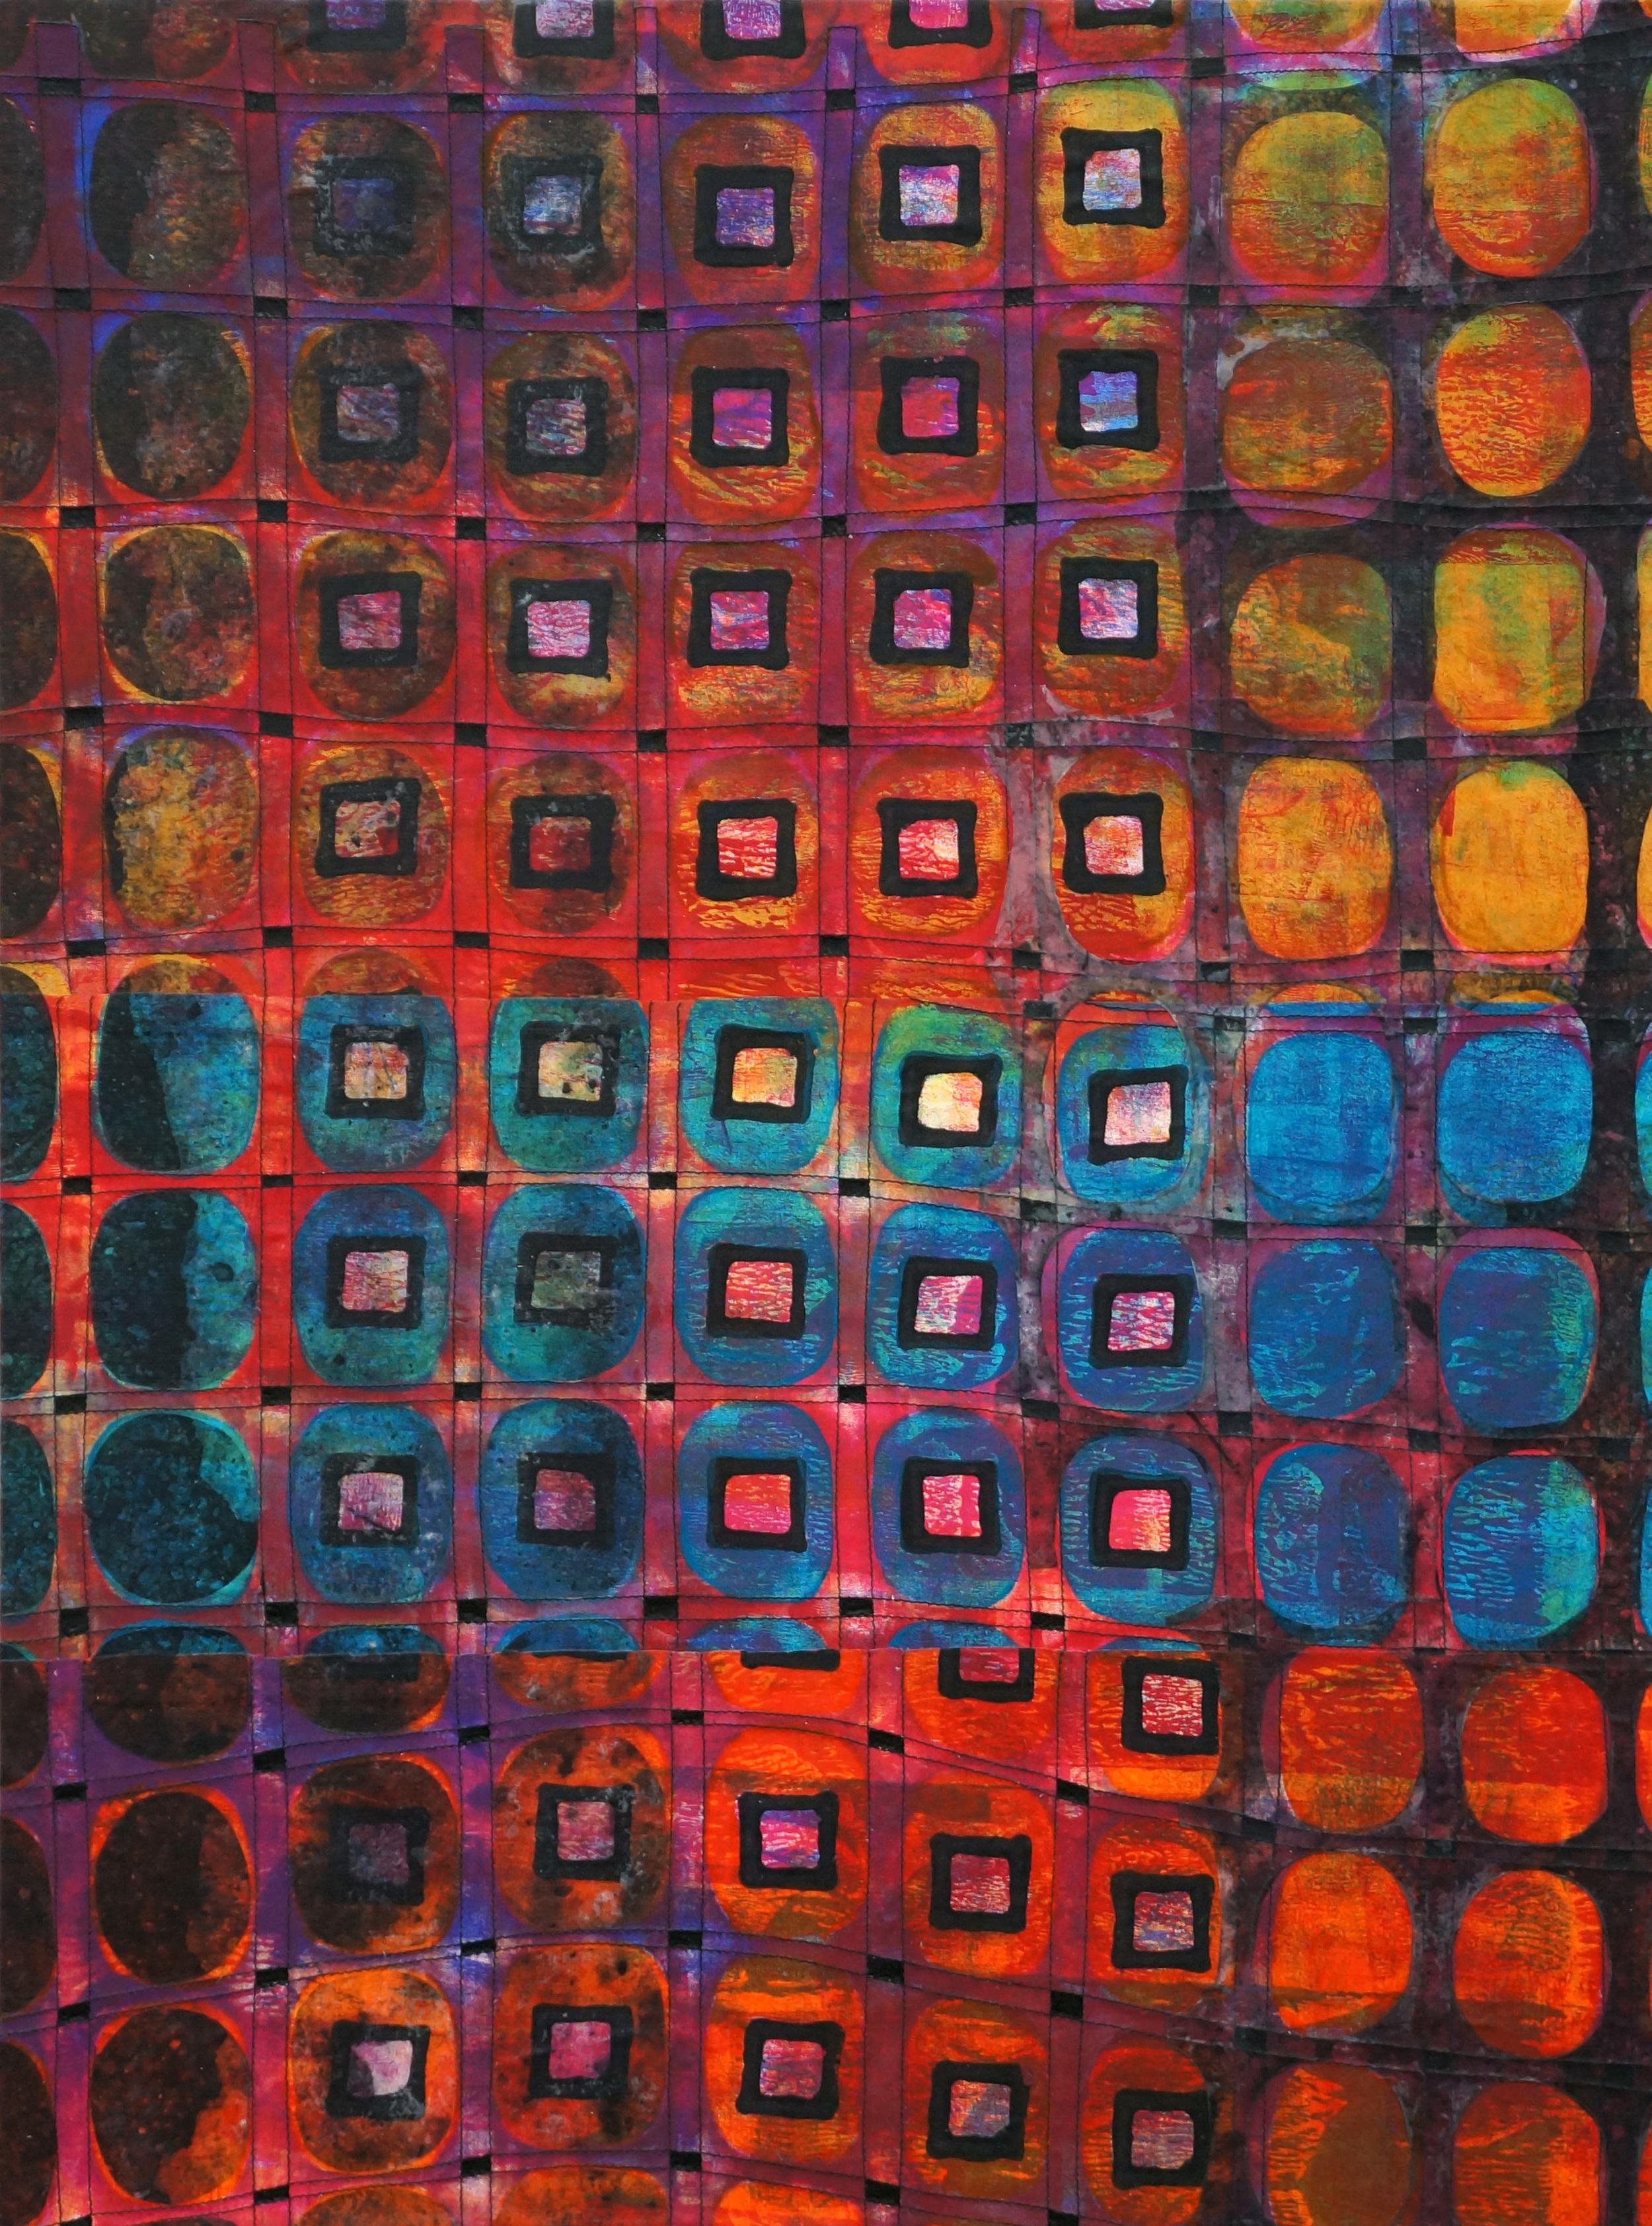 Jeanne Williamson, Street Ice on Fences #4 , mixed media on cradled board, 24x18